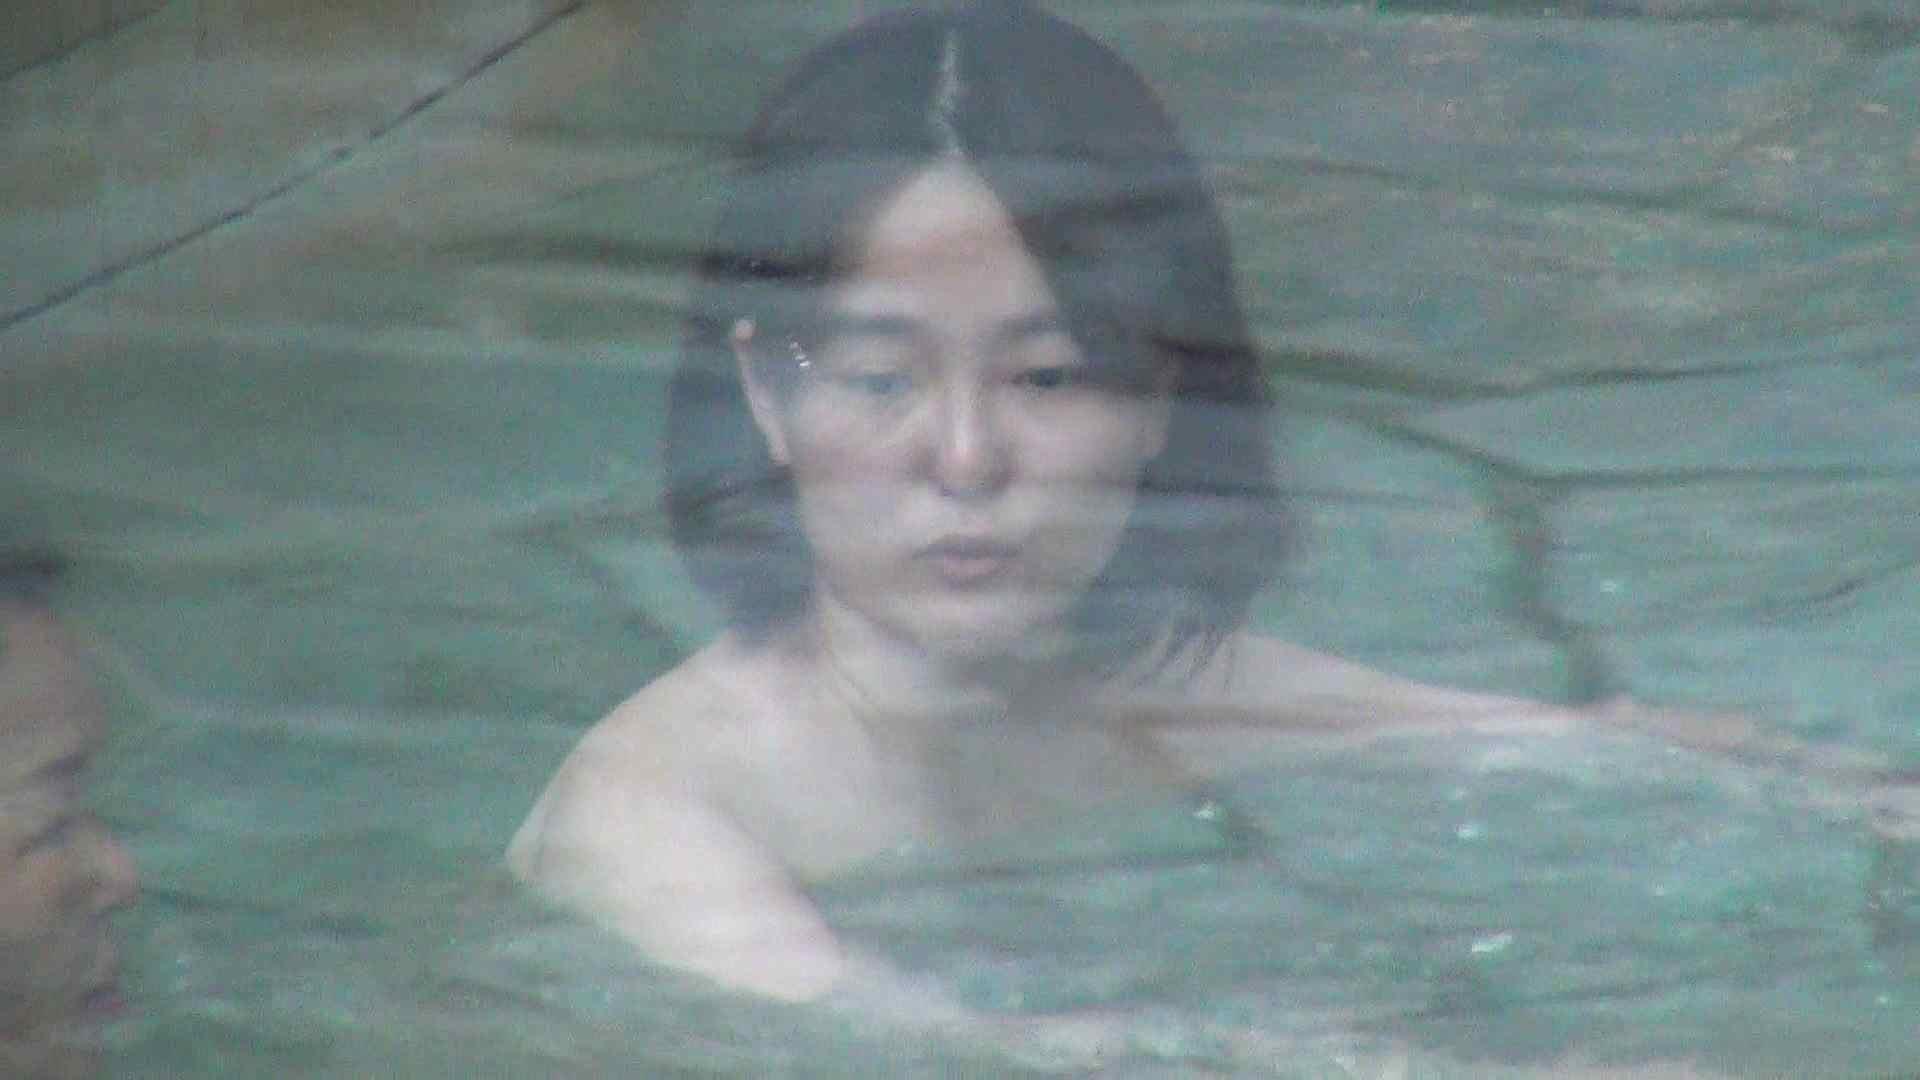 Aquaな露天風呂Vol.297 女体盗撮   OL女体  91連発 73